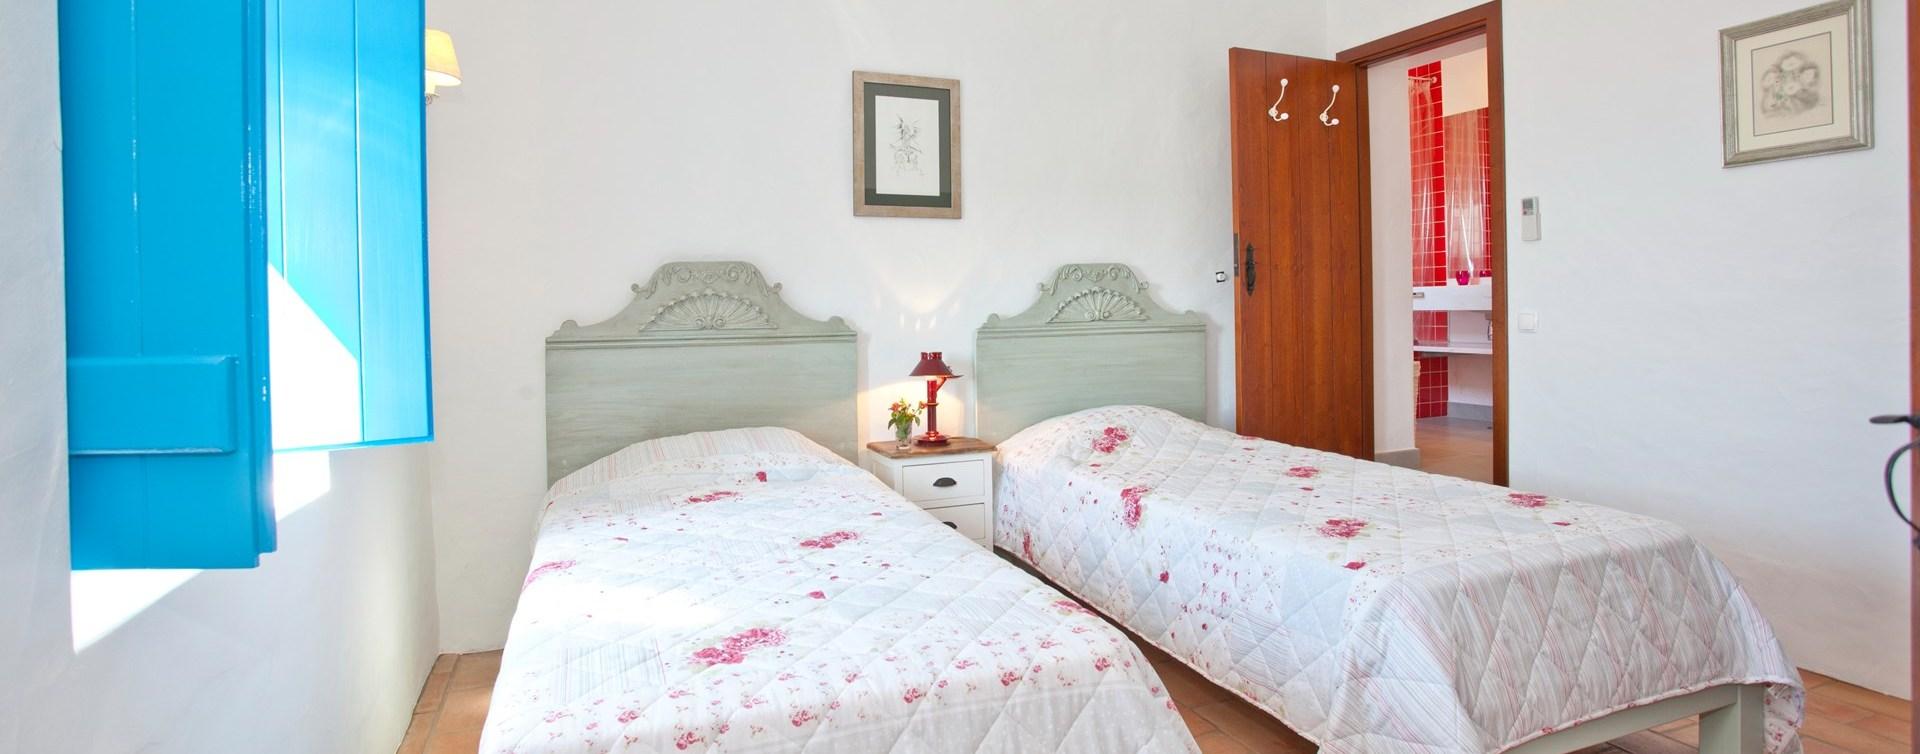 beach-cottage-twin-bedroom1